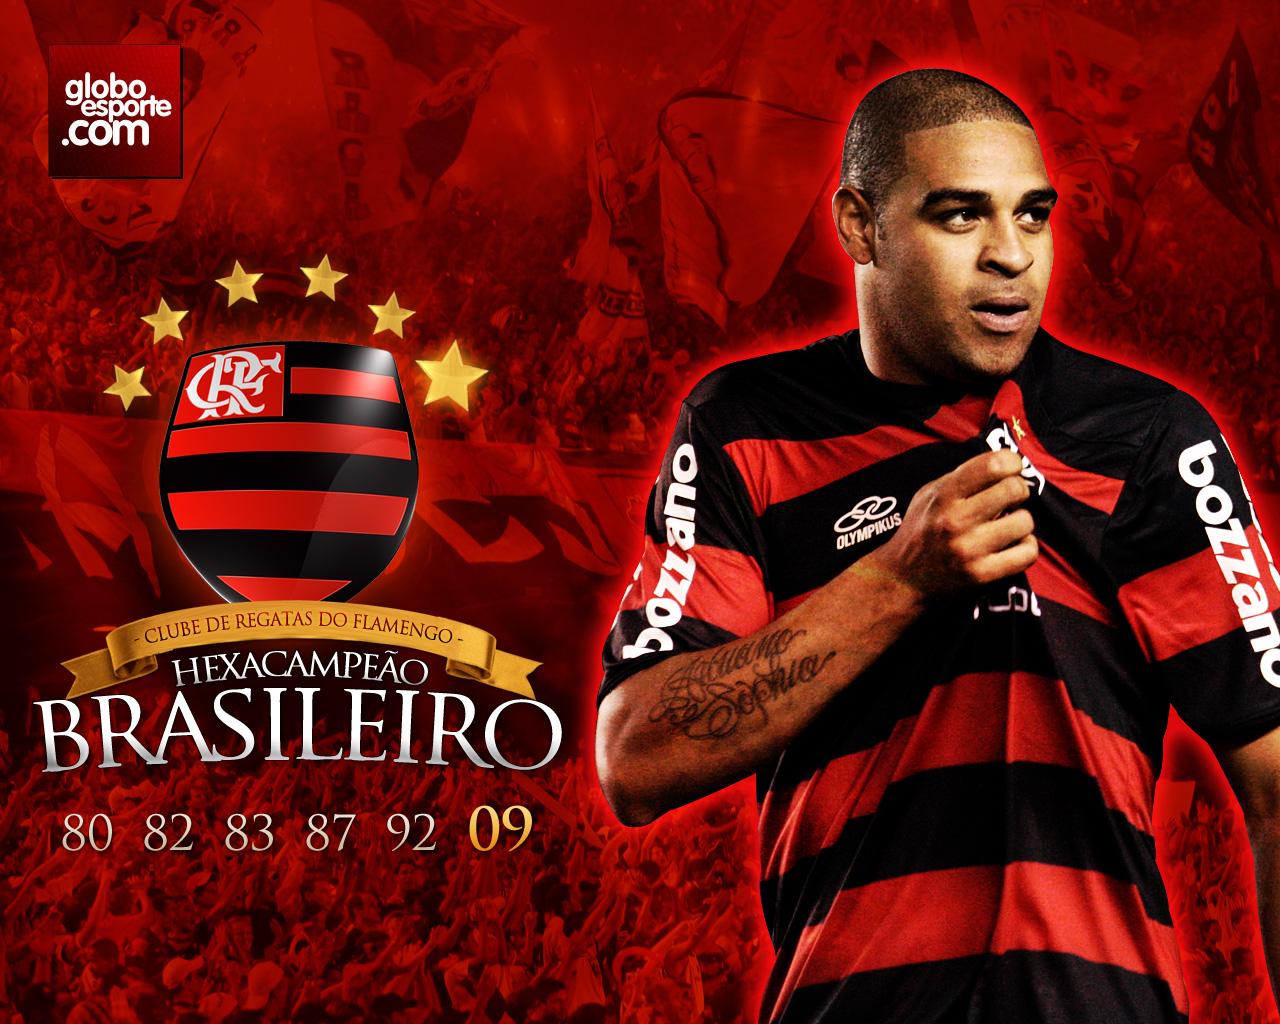 http://2.bp.blogspot.com/-mdwwV-8xU1U/UOYayy9n5bI/AAAAAAABGMo/XaEJ6HE3sL8/s1600/wallpaper-+Flamengo+-wallpaper+(23).jpg